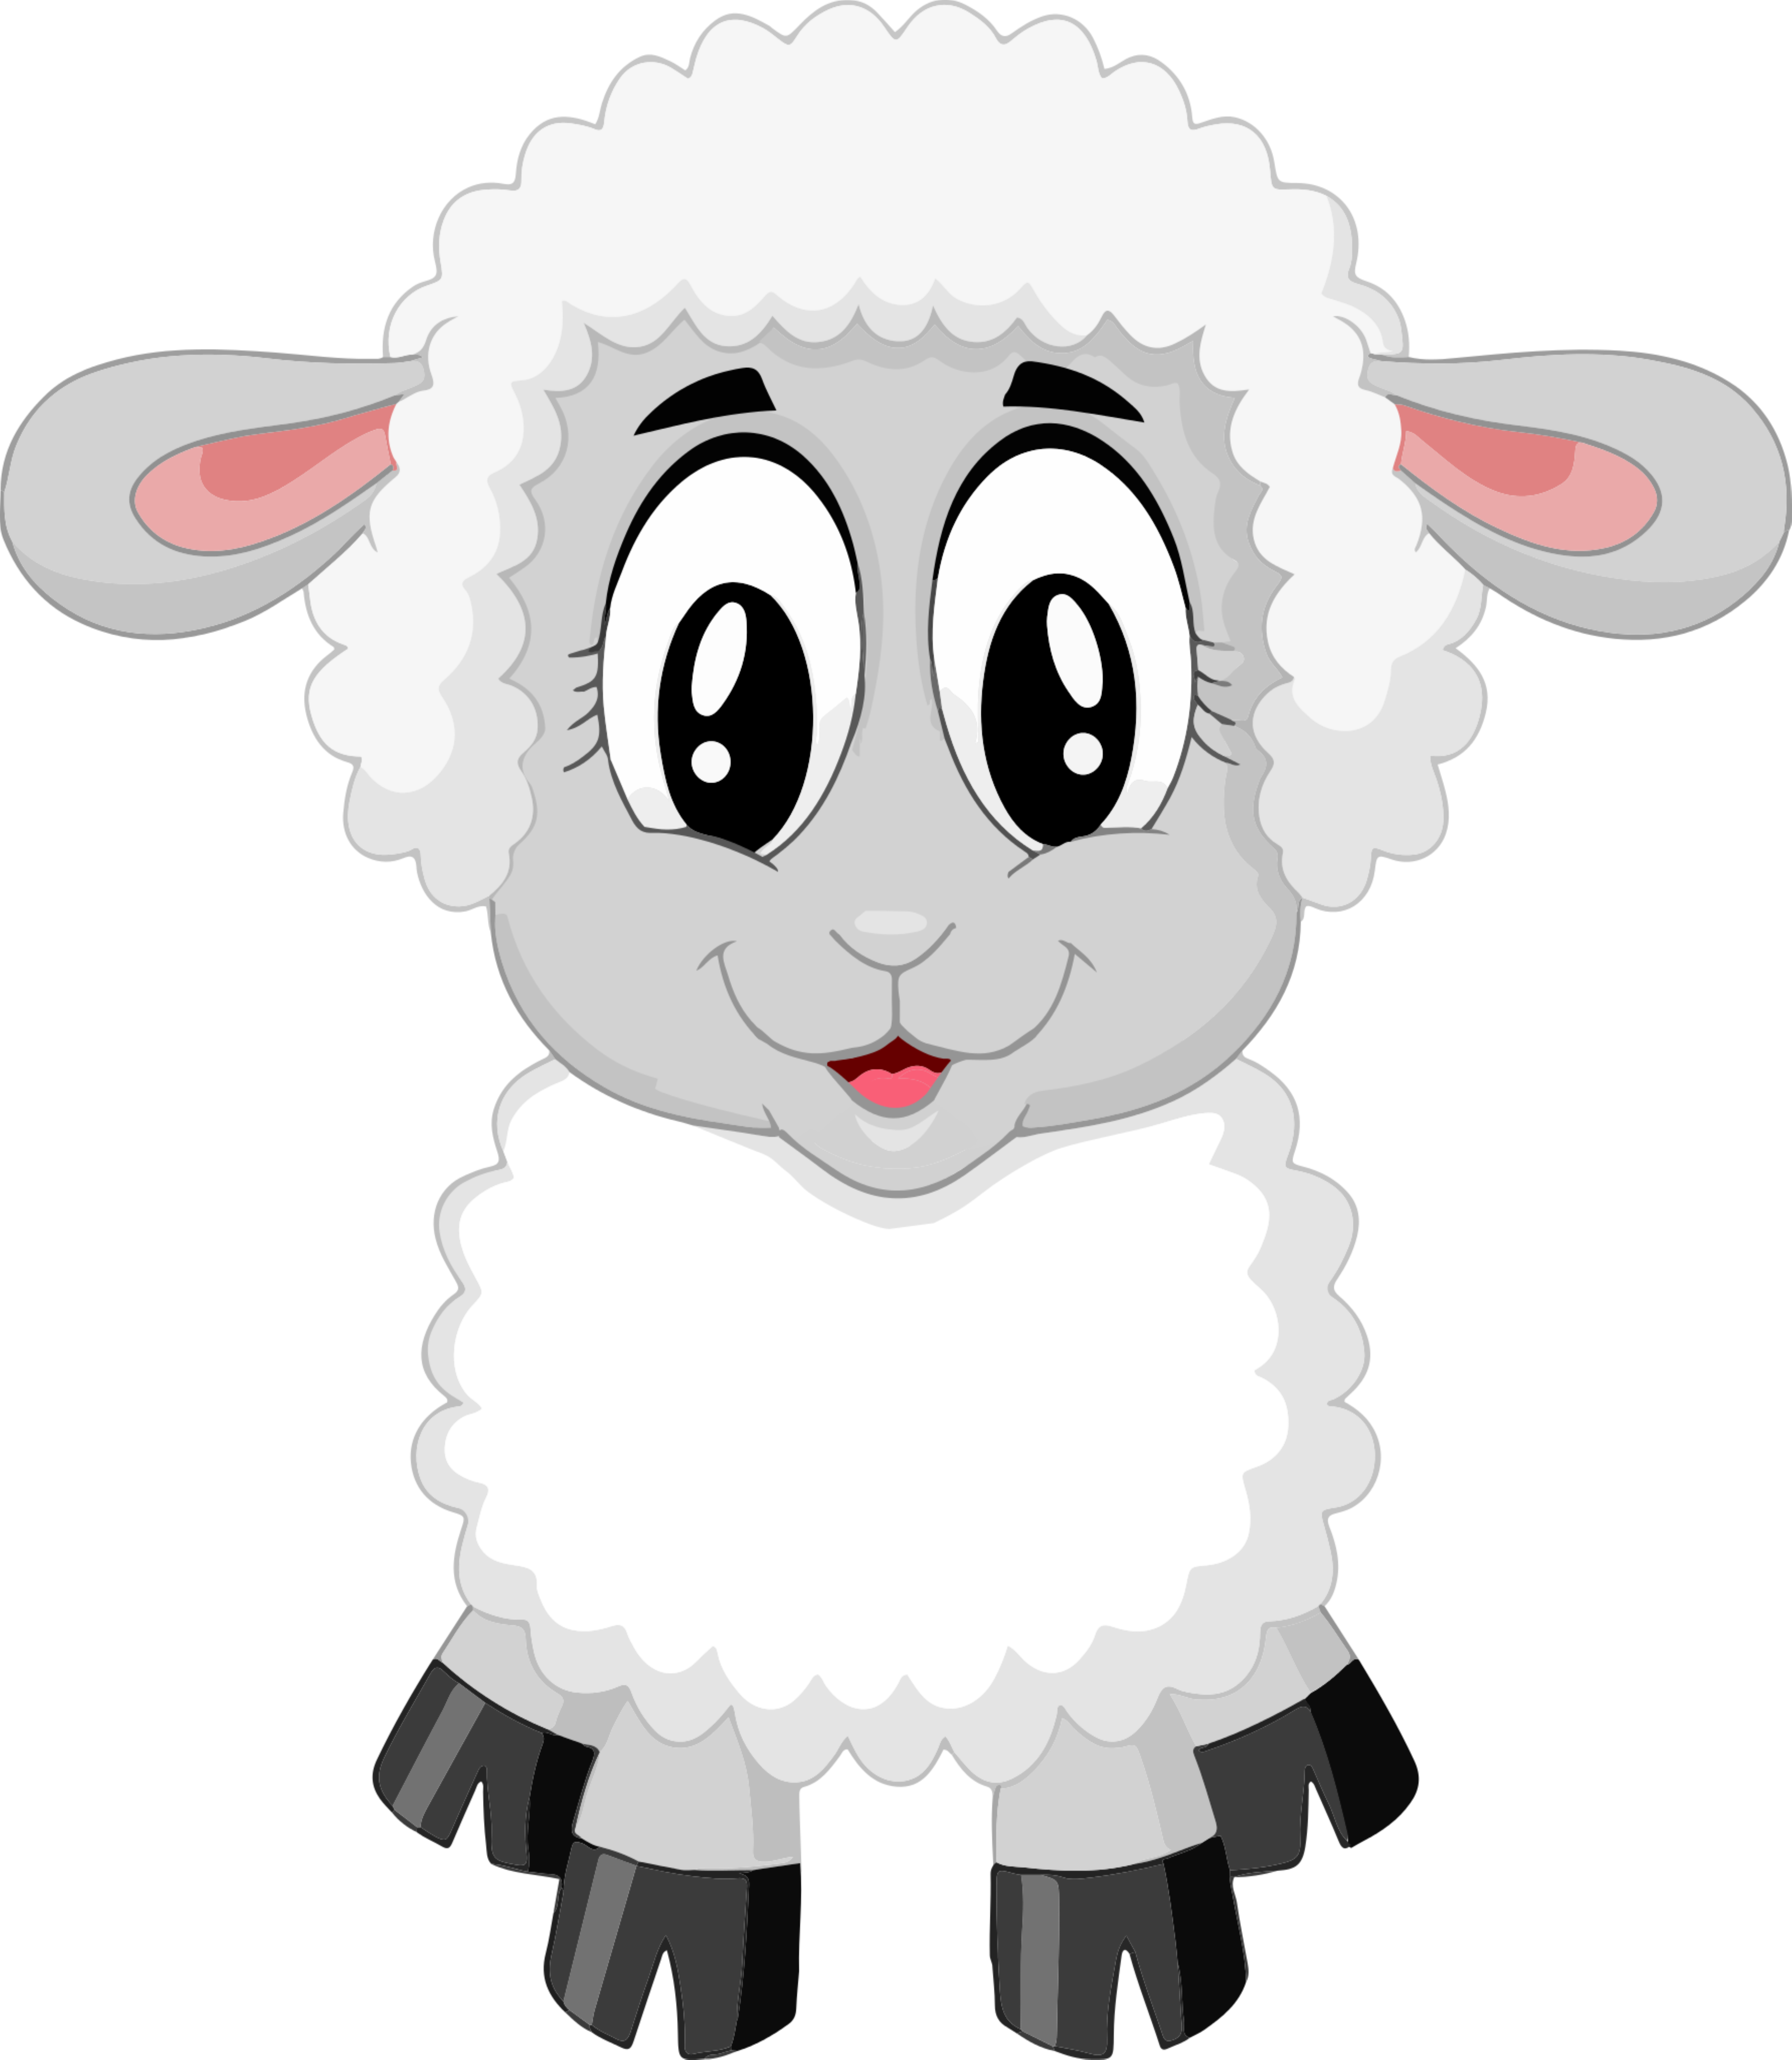 Sheep Design Farm Animals Grazing Lamb T Shirt Design Circus T Shirt Designs Sheep Cartoon Cute Sheep Animal Clipart